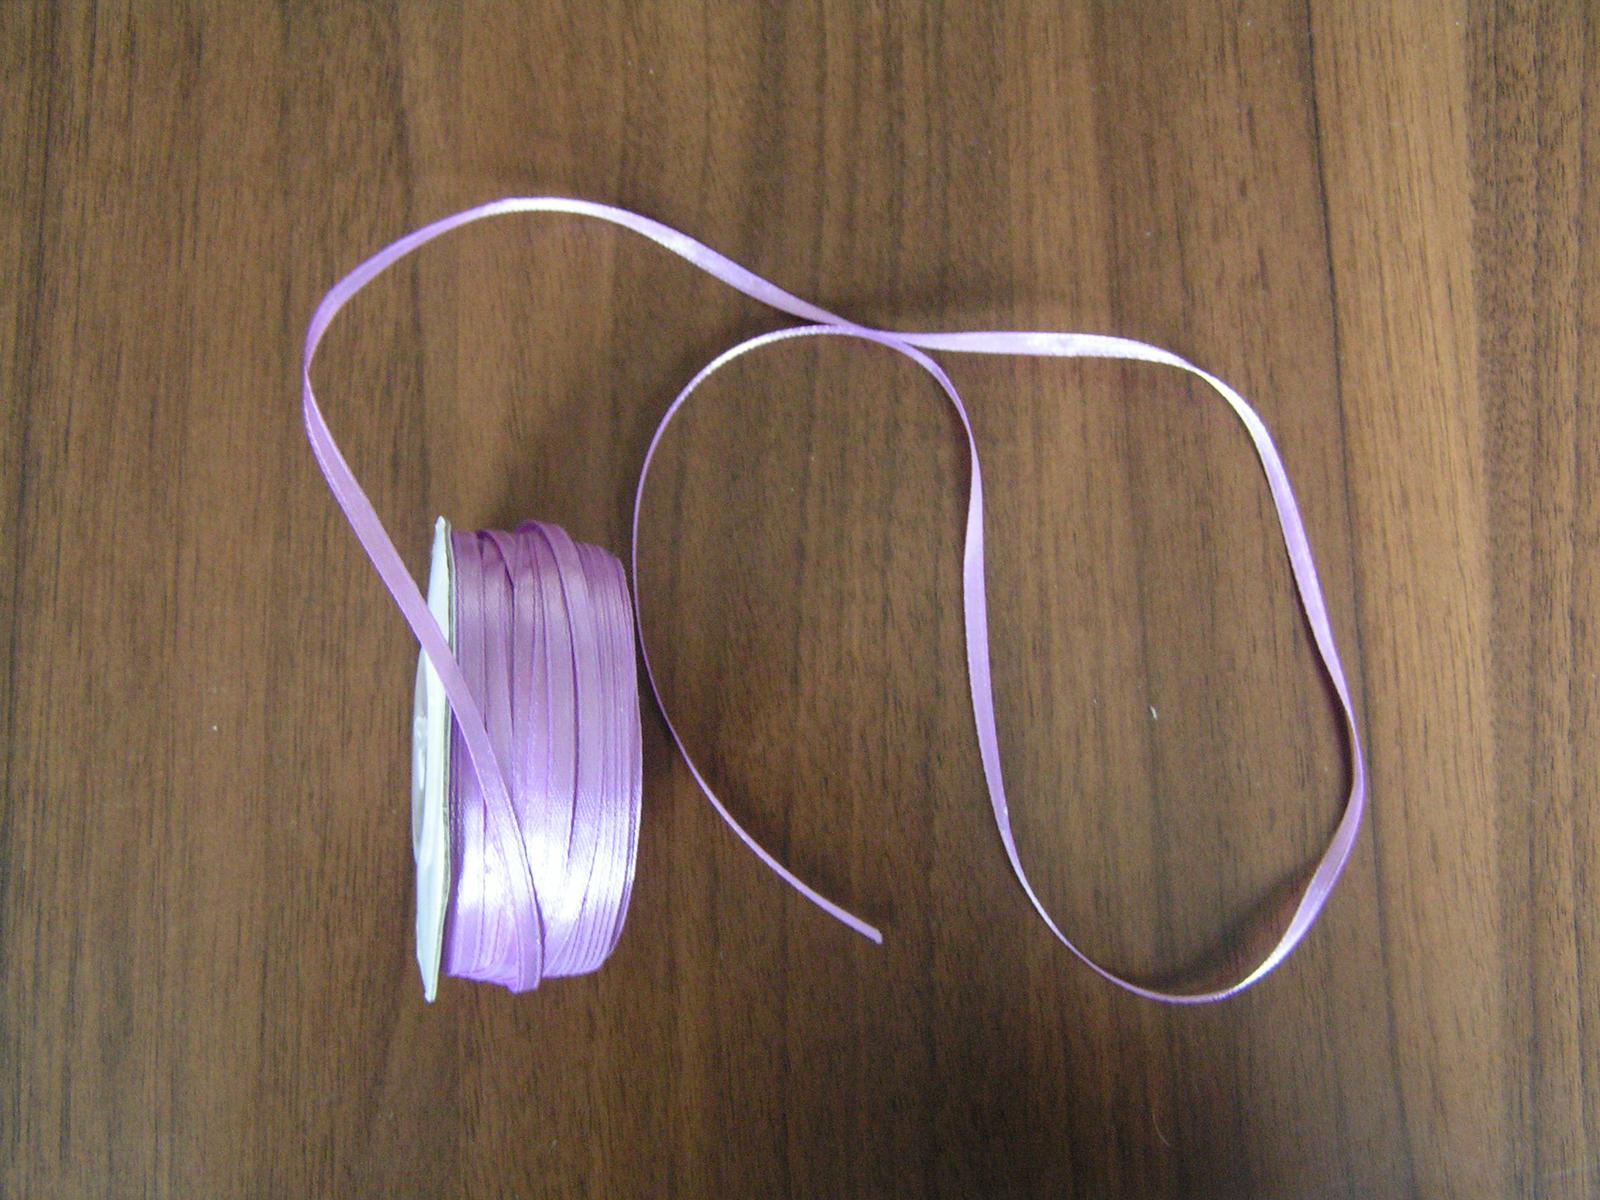 Saténová stuha 3 mm - Obrázek č. 1